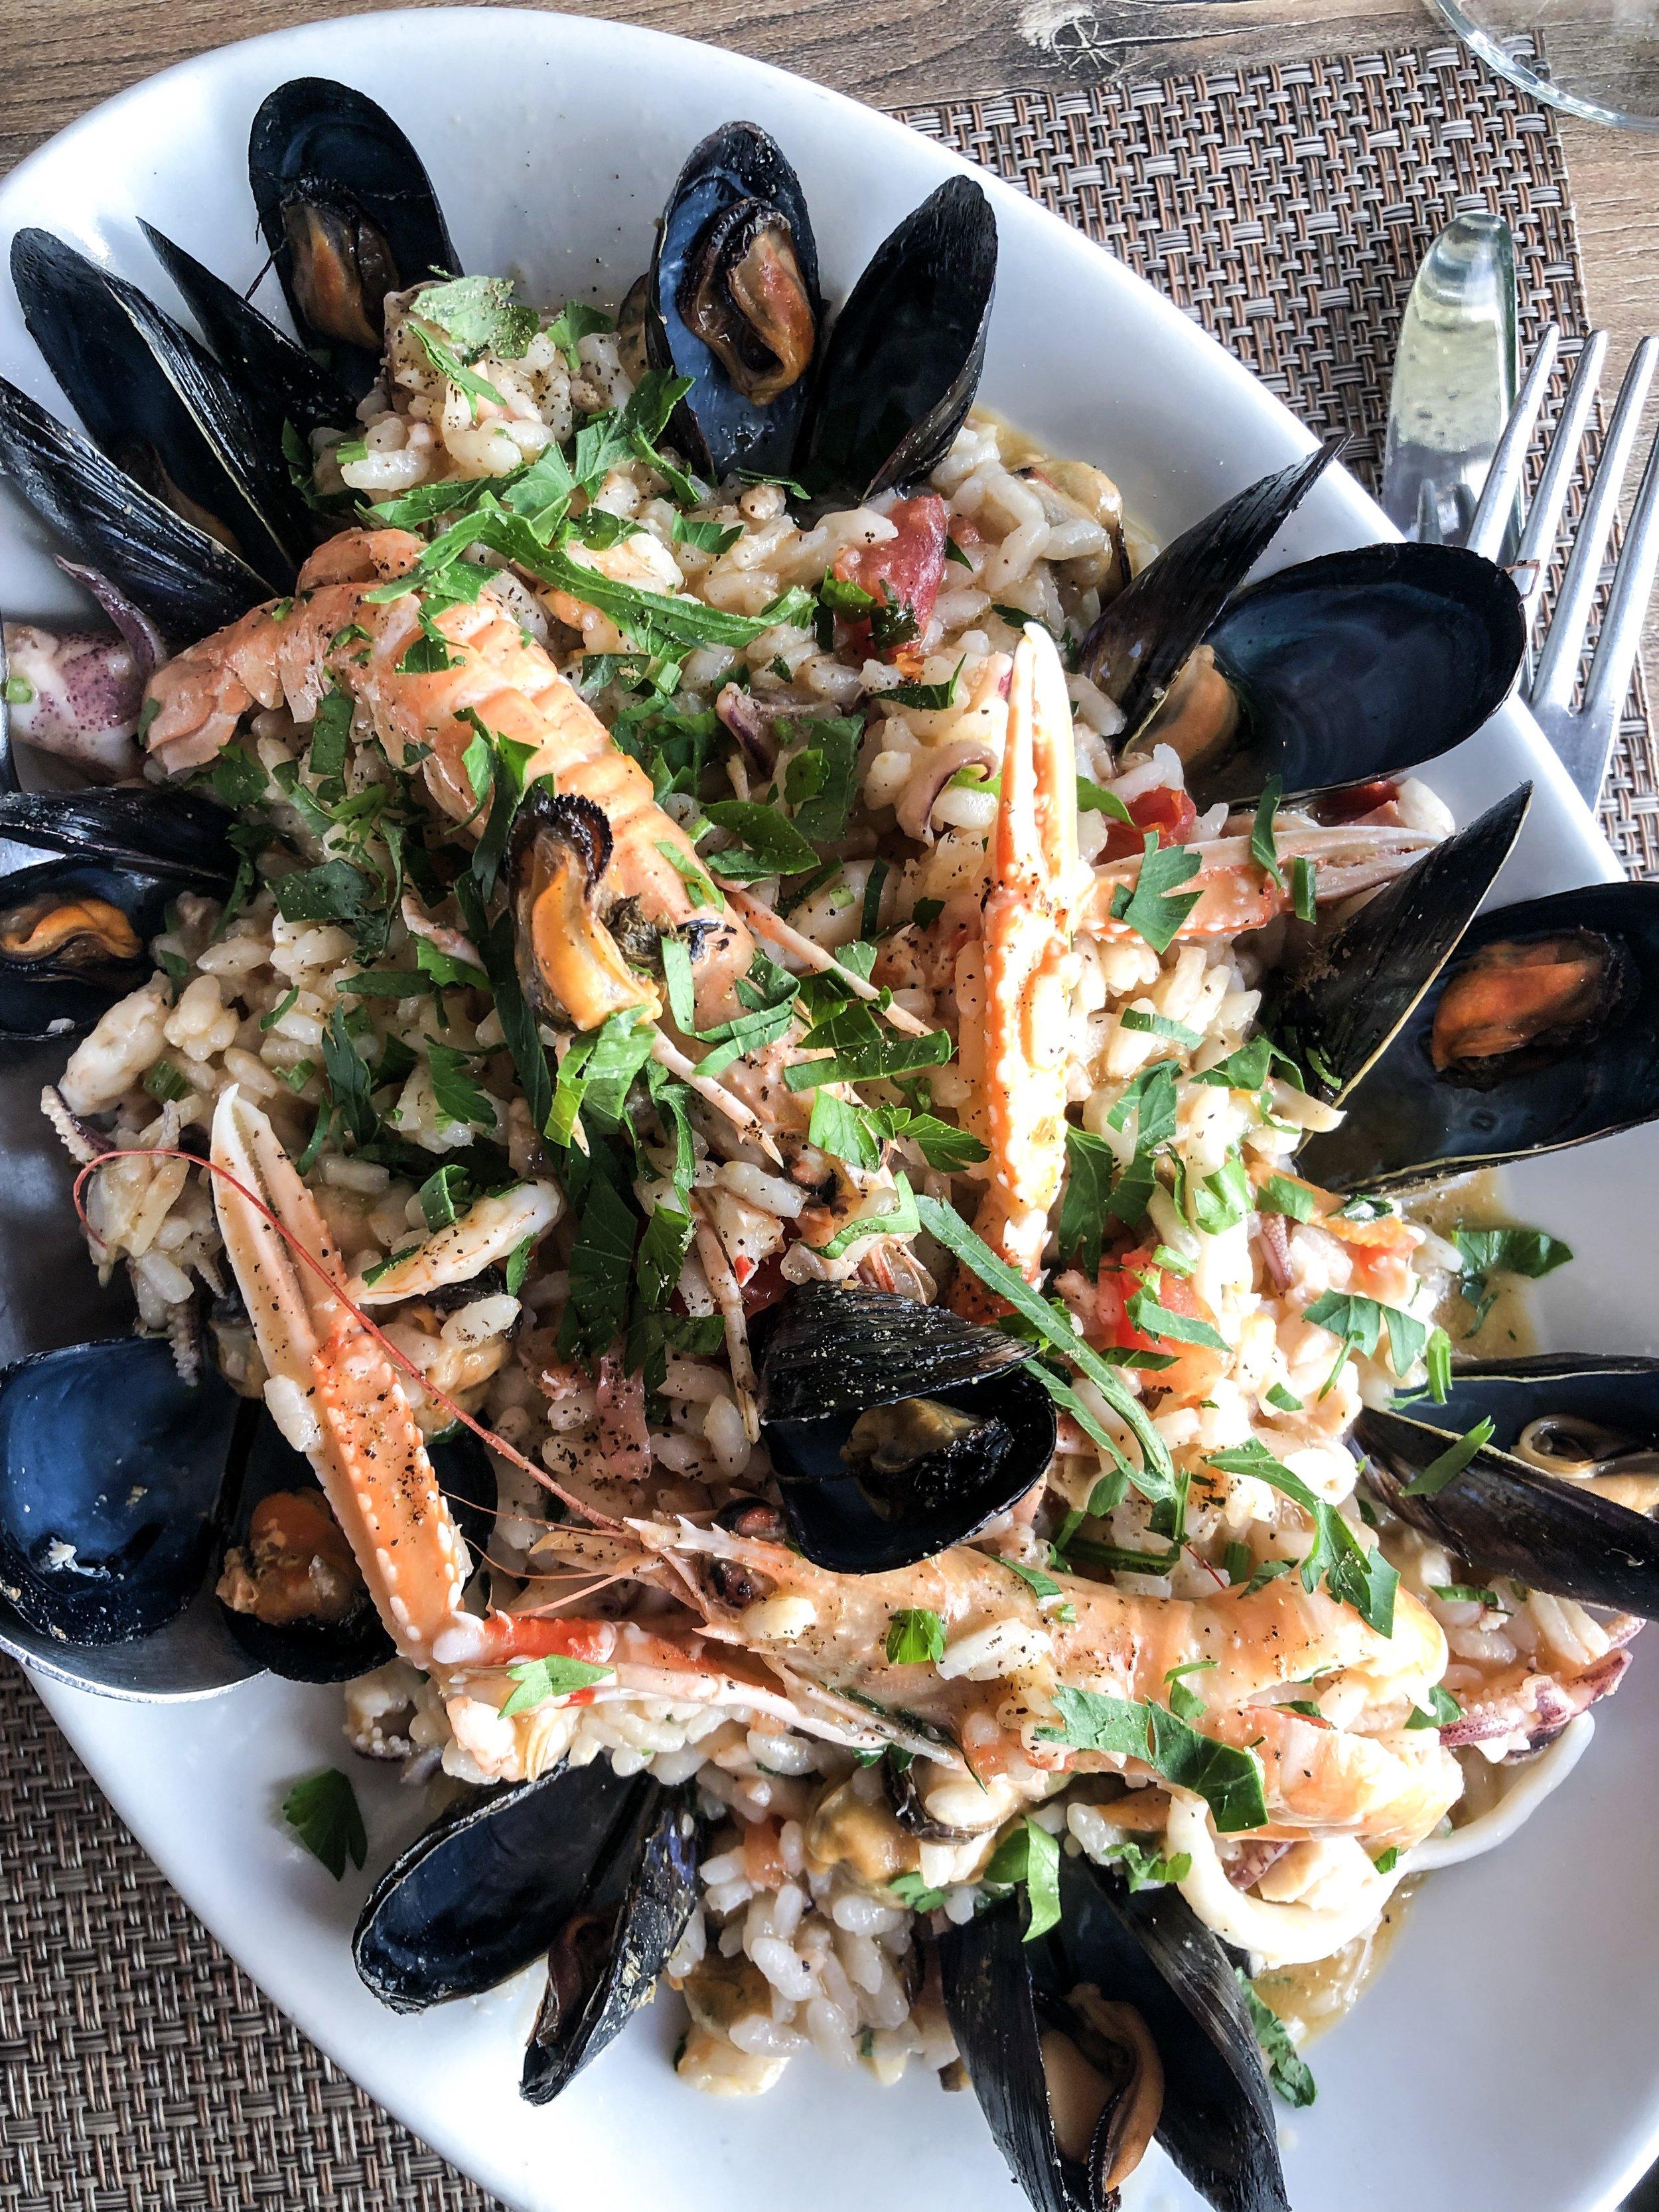 Seafood paella at Osteria La Caletta.